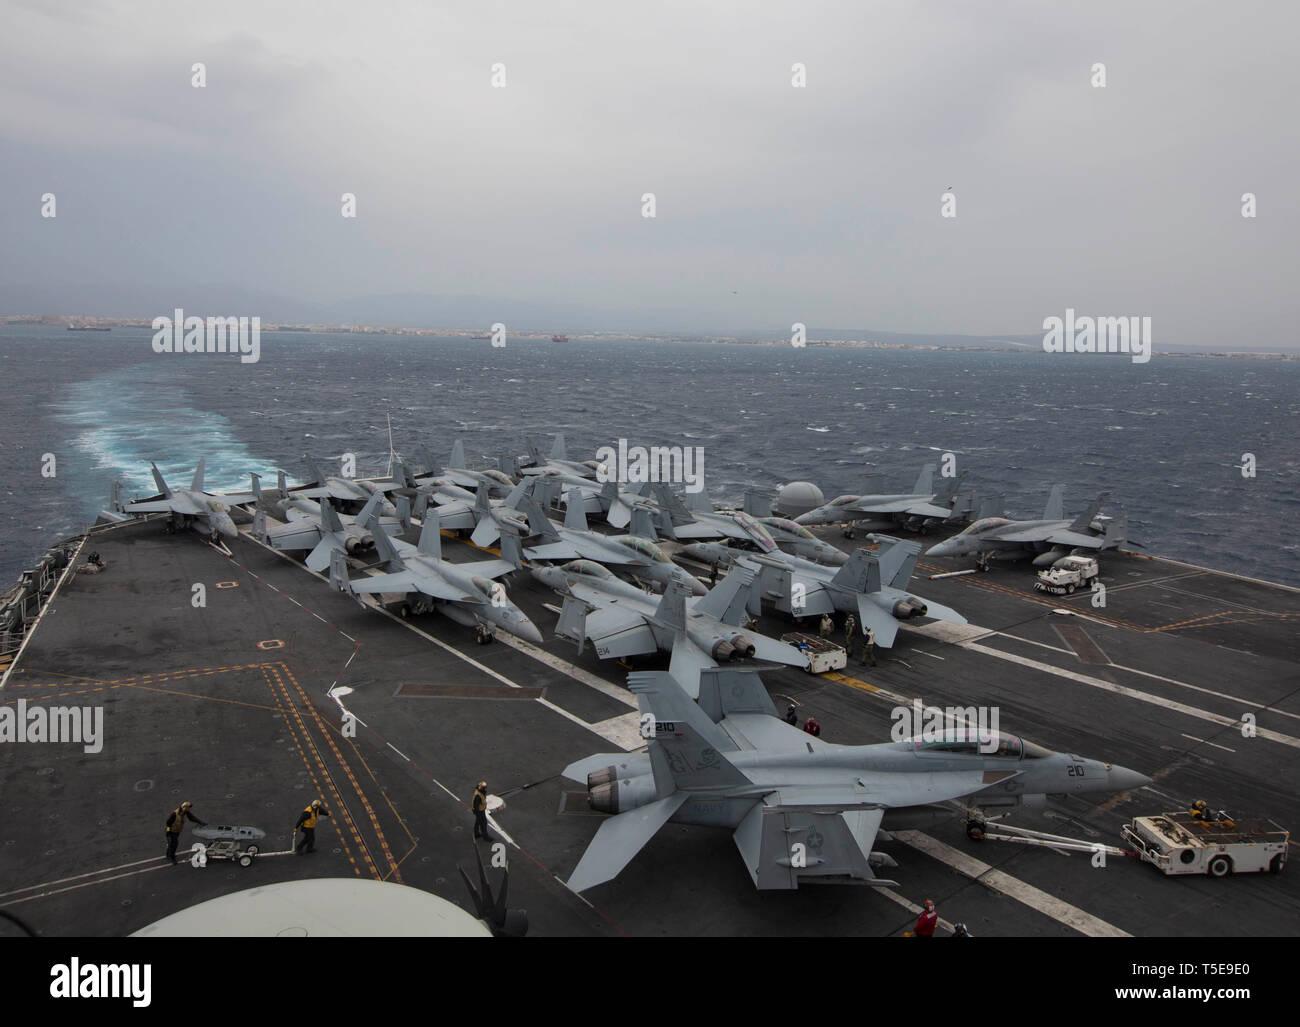 Uss Nimitz Deployment Schedule 2019 190420 N PW030 1041 MEDITERRANEAN SEA (April 20, 2019) The Nimitz